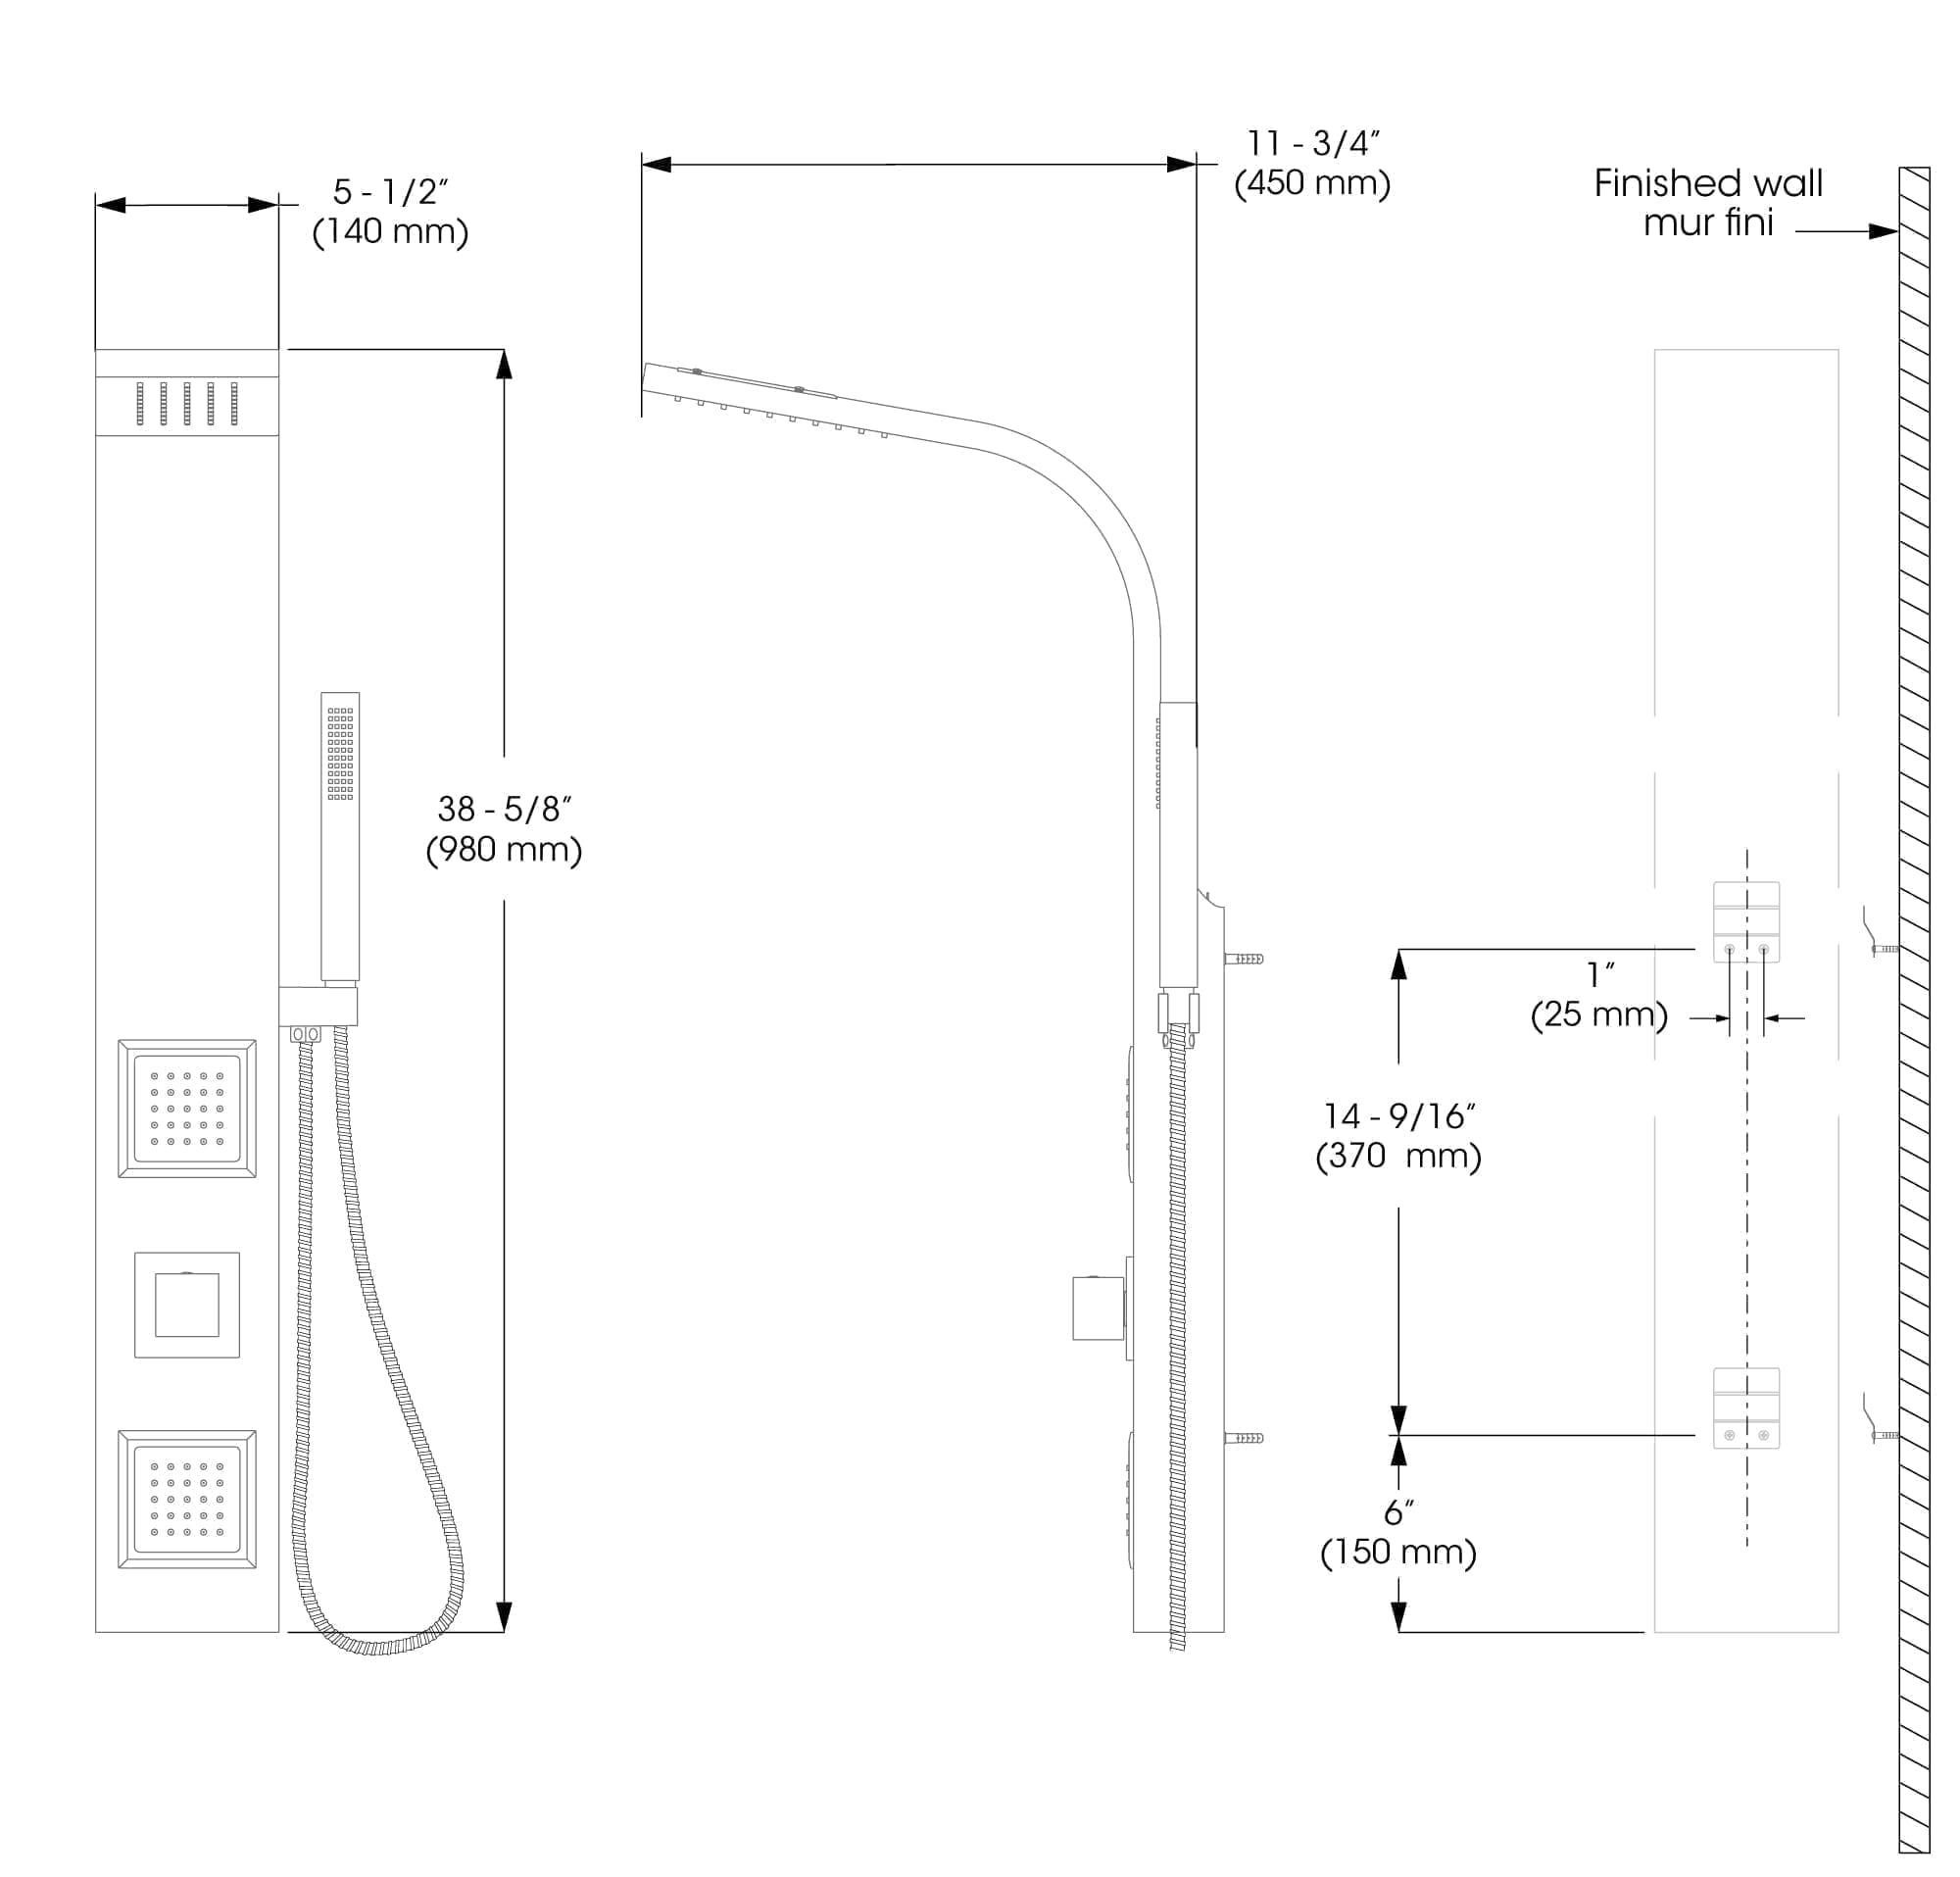 3 Way Diverter Valve Diagram on Sd Triple Wiring Diagram